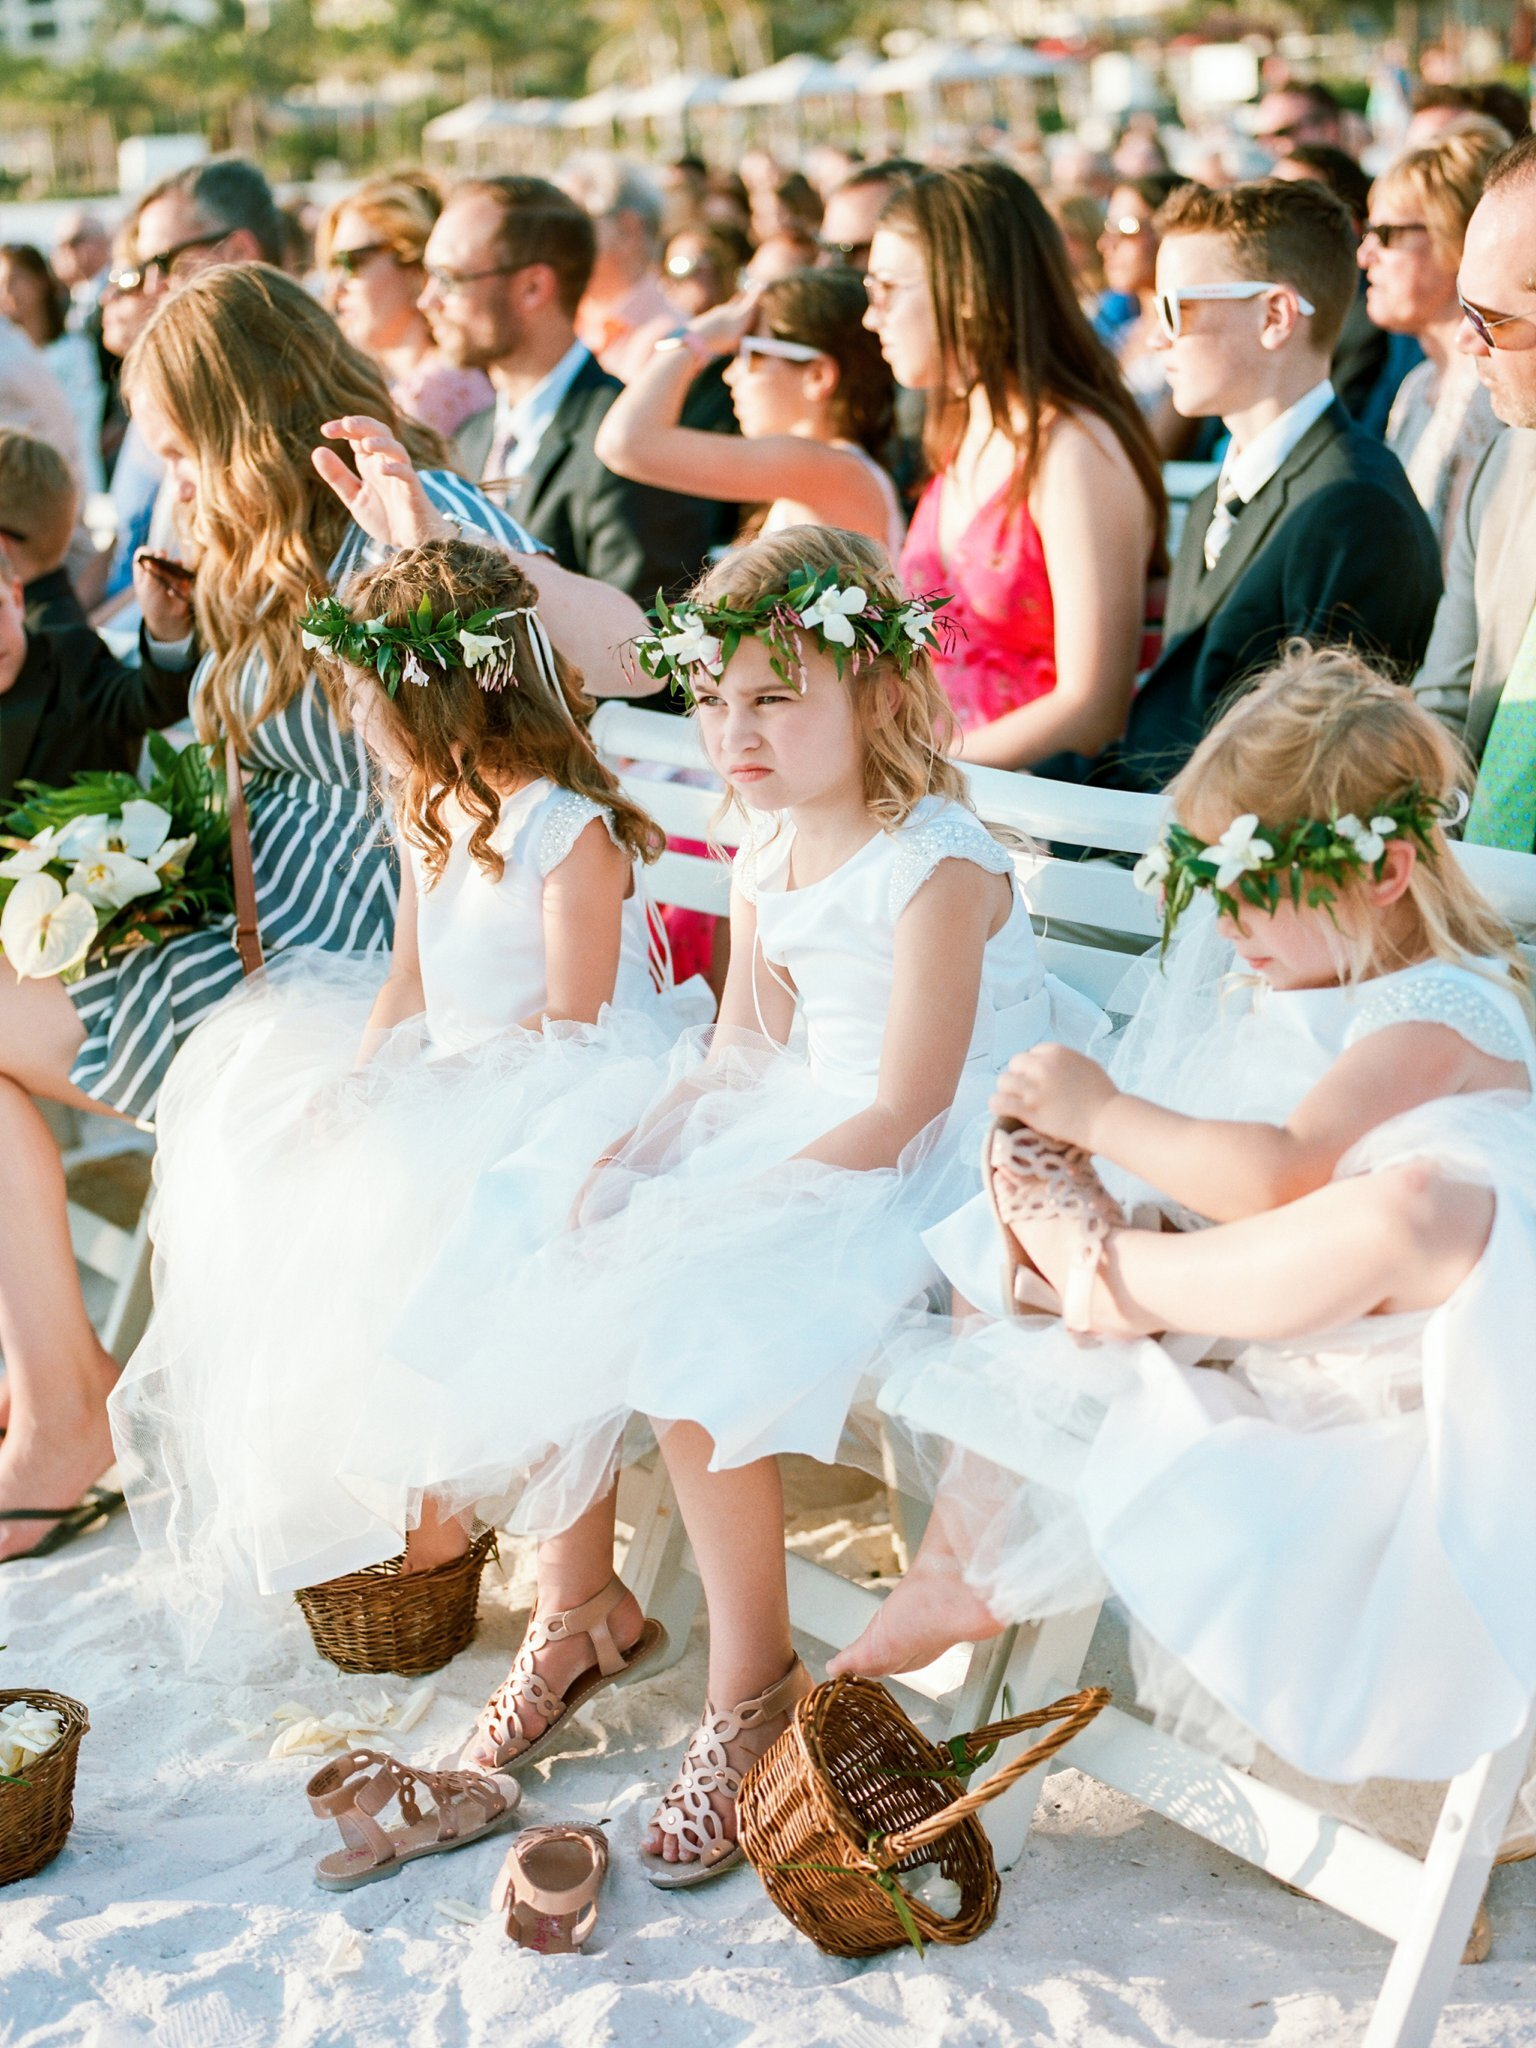 jw marriott marco island wedding photographer marco island wedding photographer shannon griffin photography_0179.jpg